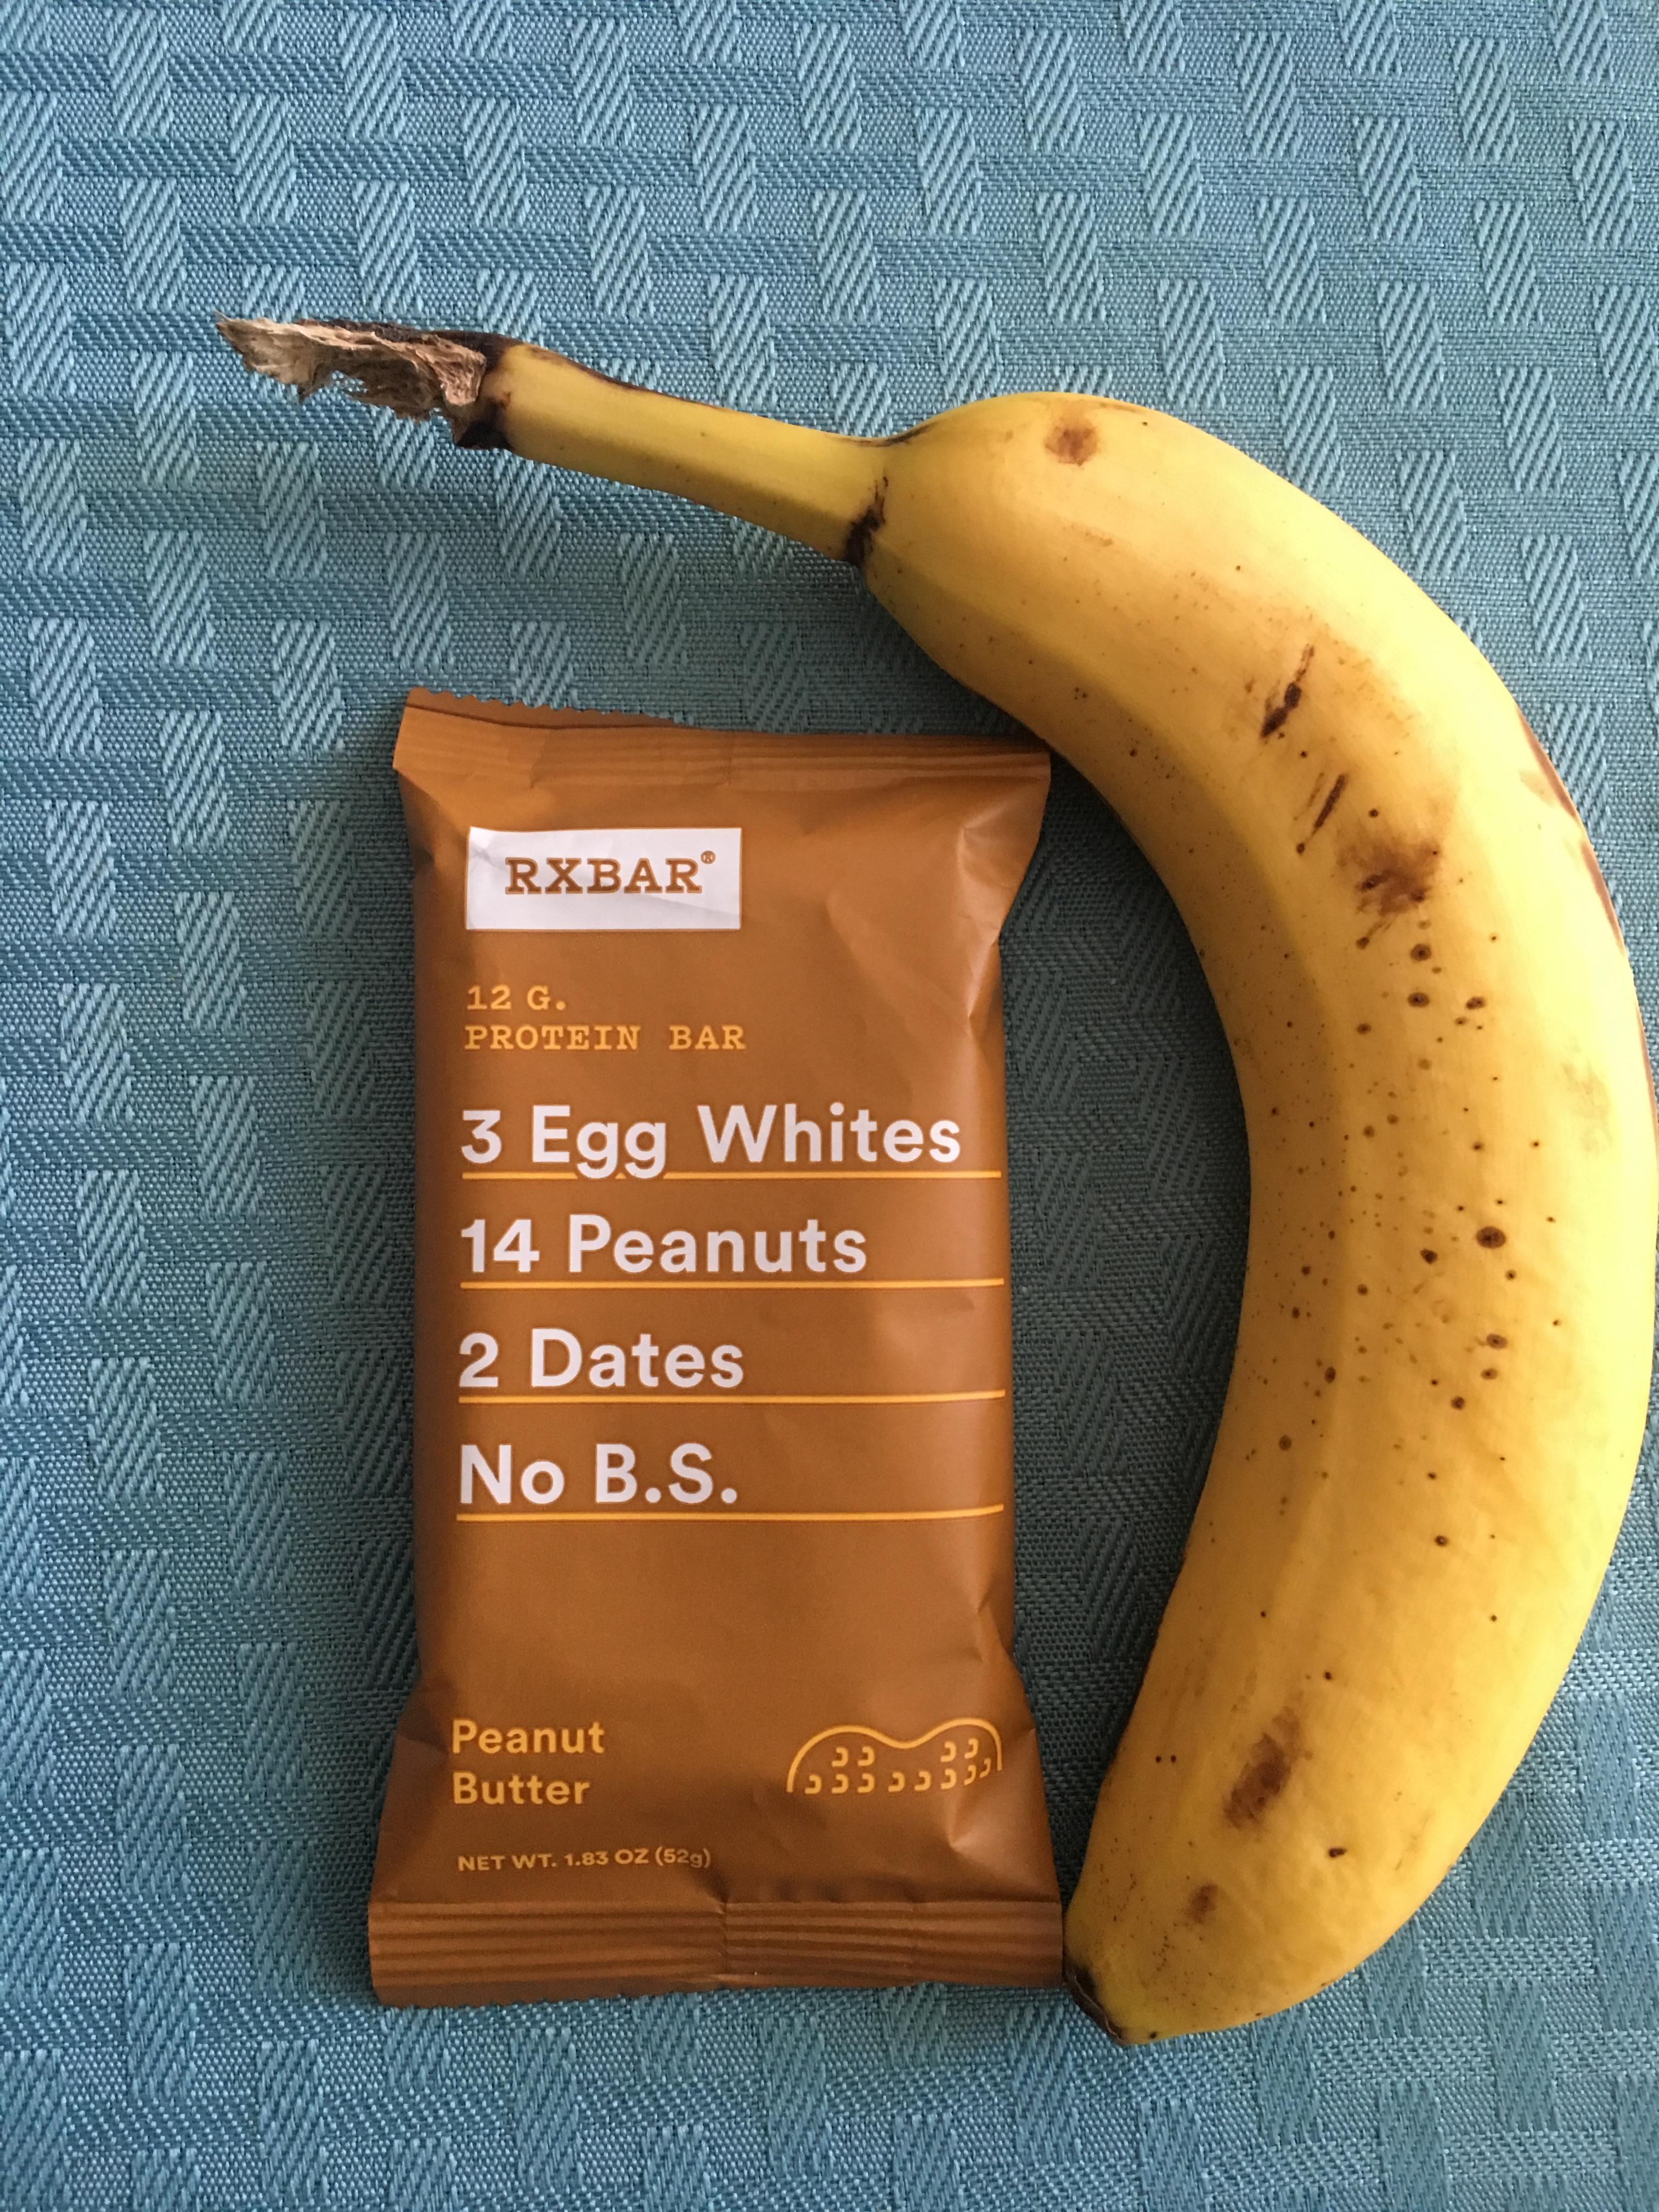 RXBar and banana